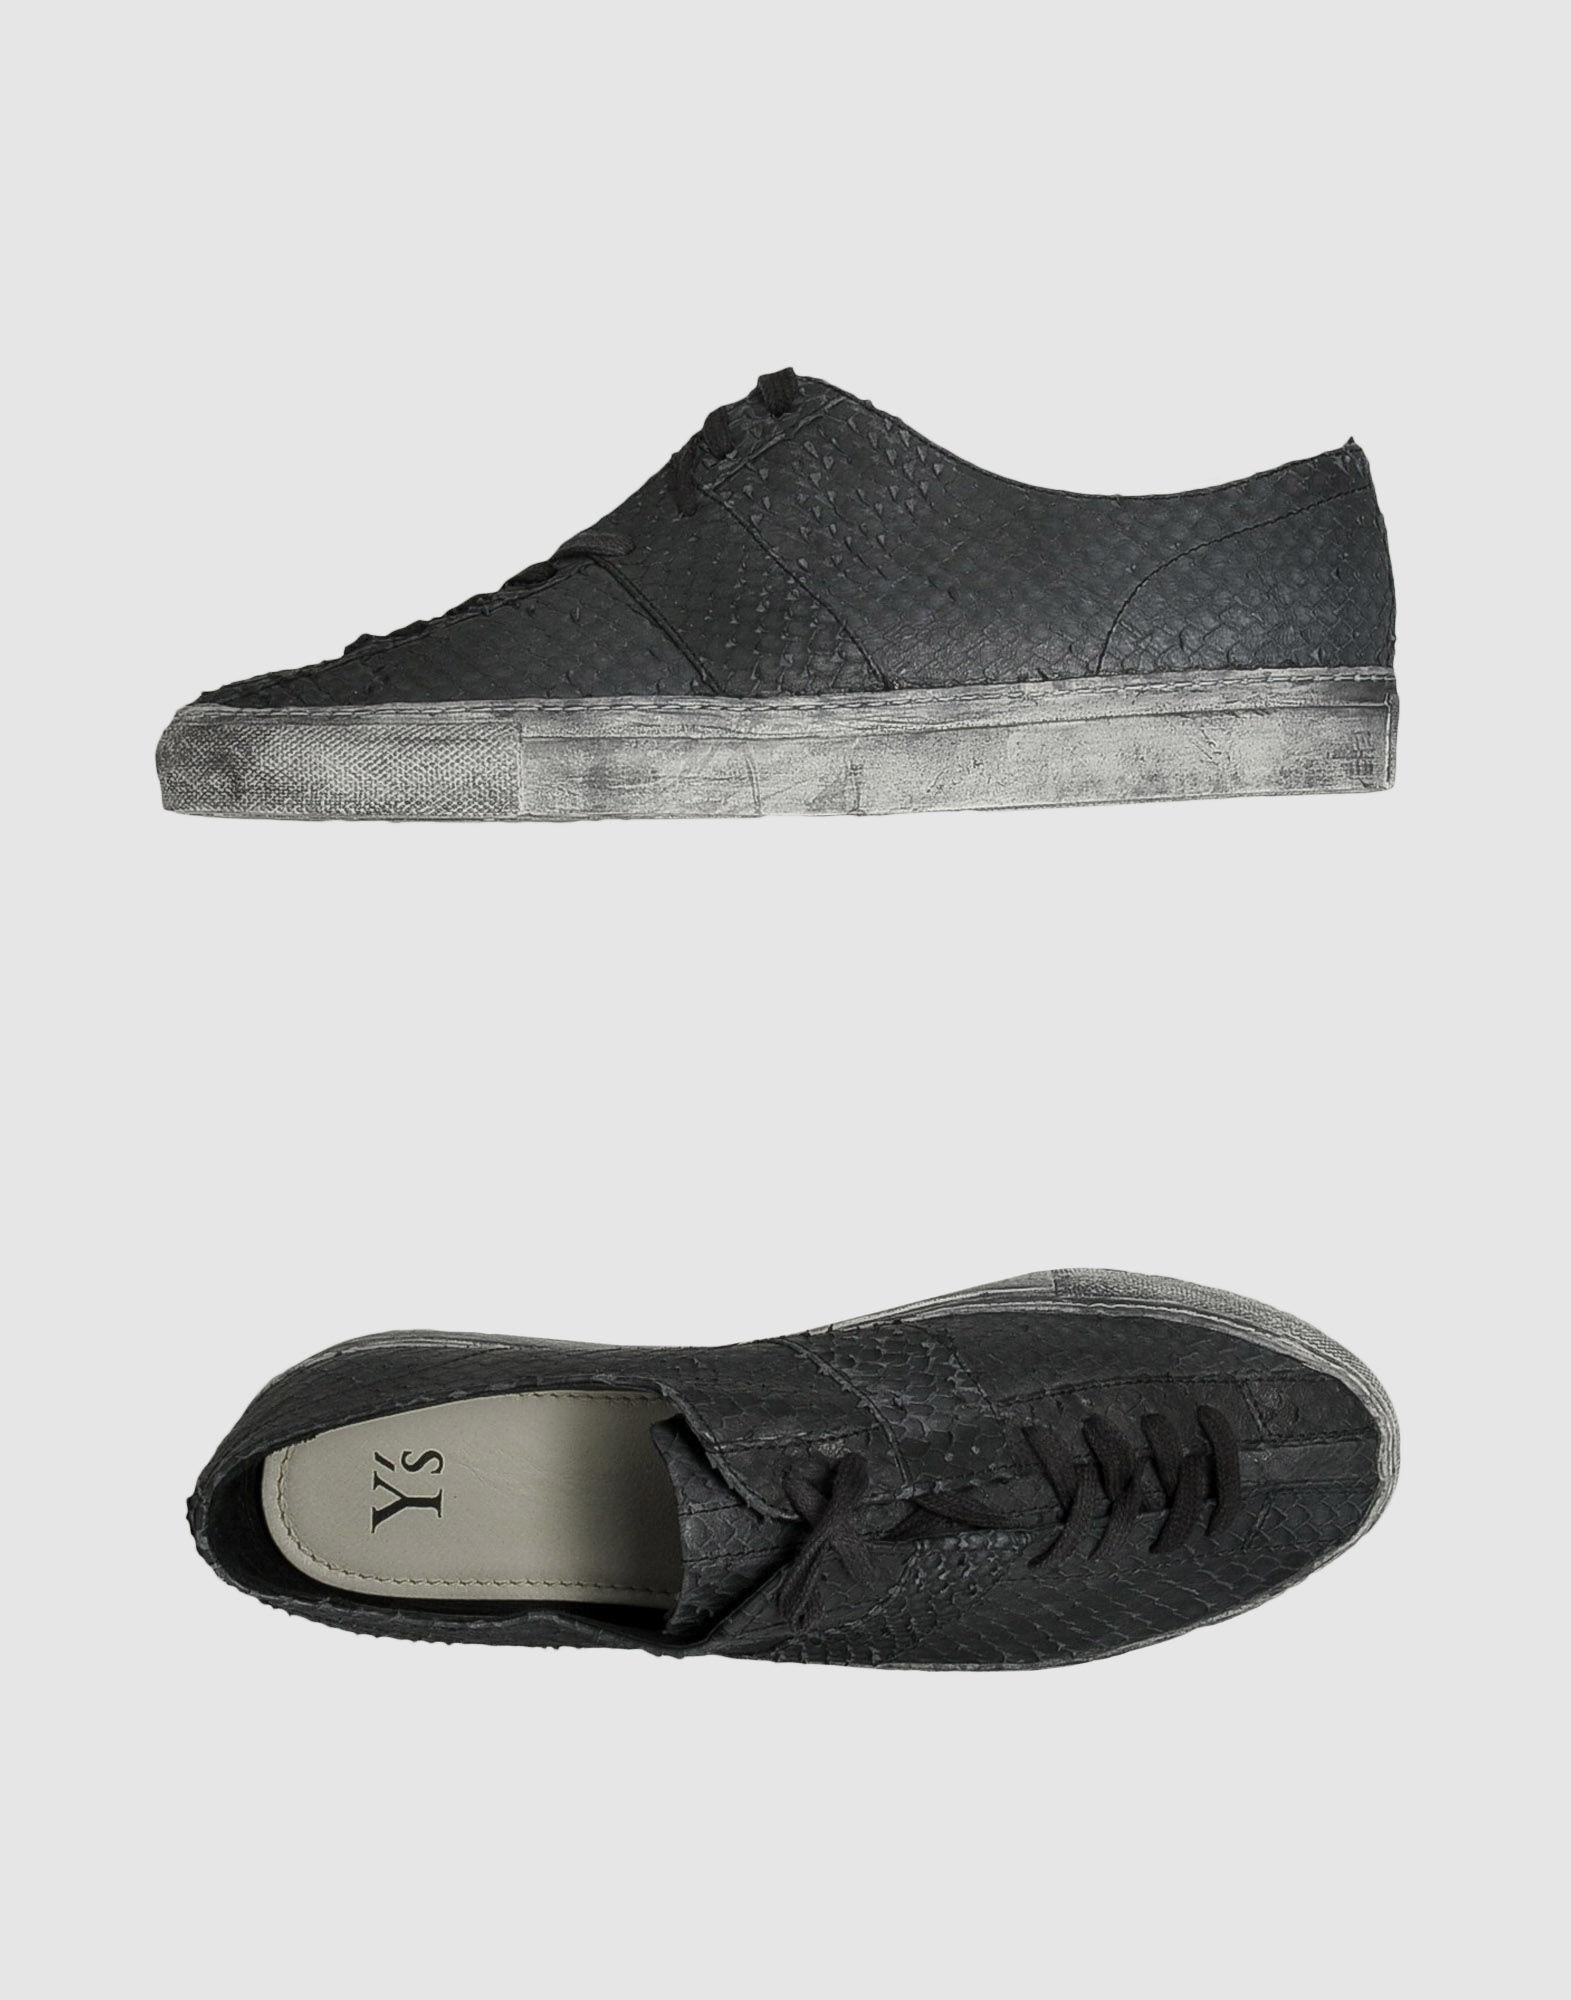 ys-yohji-yamamoto-steel-sneakers-gray-pr